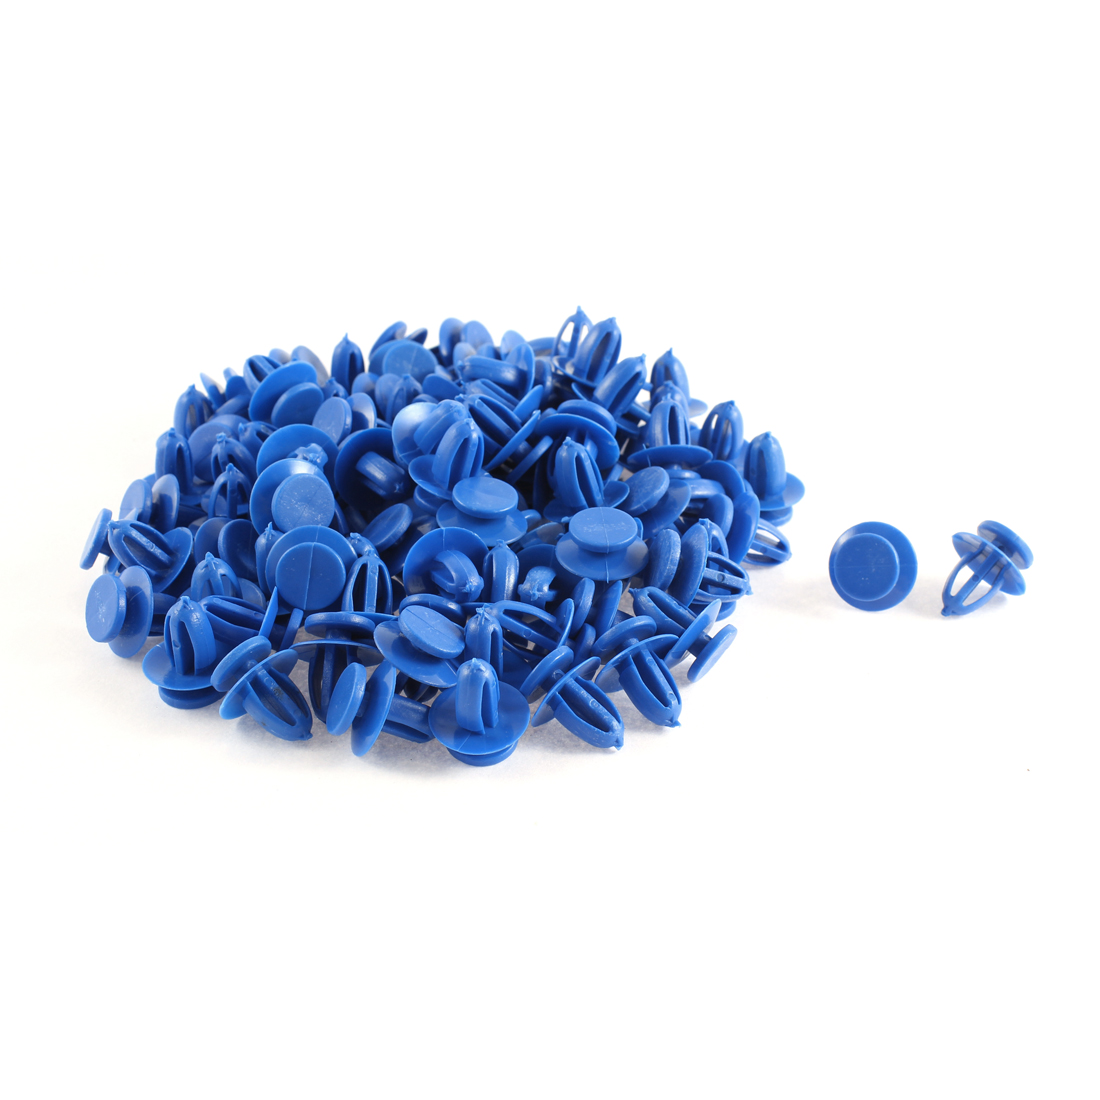 30 Pcs Blue Car Plastic Rivets Trim Fastener Retainer Clips 9mm x 13mm x 17mm